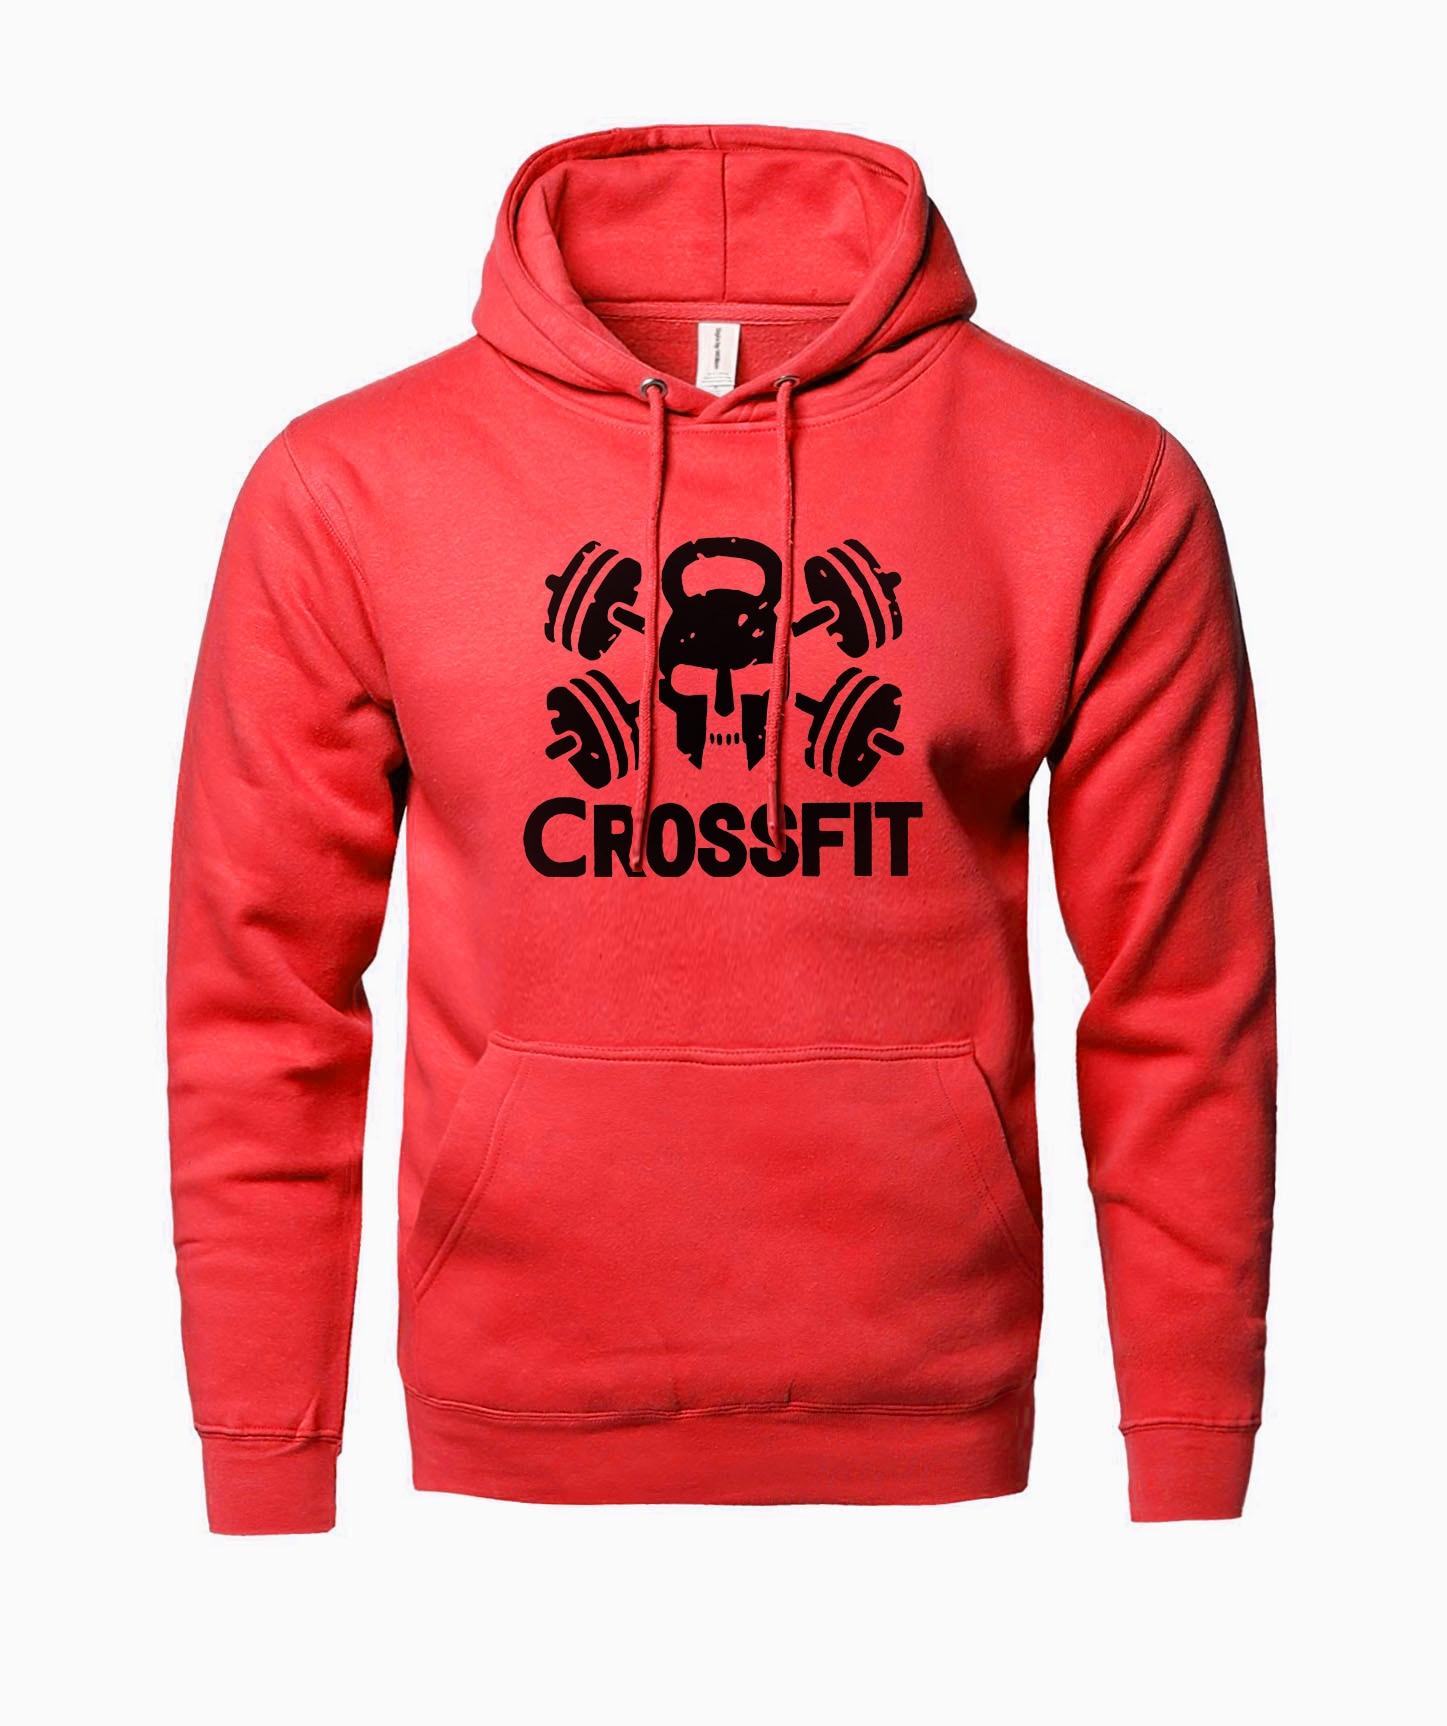 Crossfit men hoodies 2019 hot sale sweatshirt men spring winter fleece high quality fitness hooded men fashion brand clothing